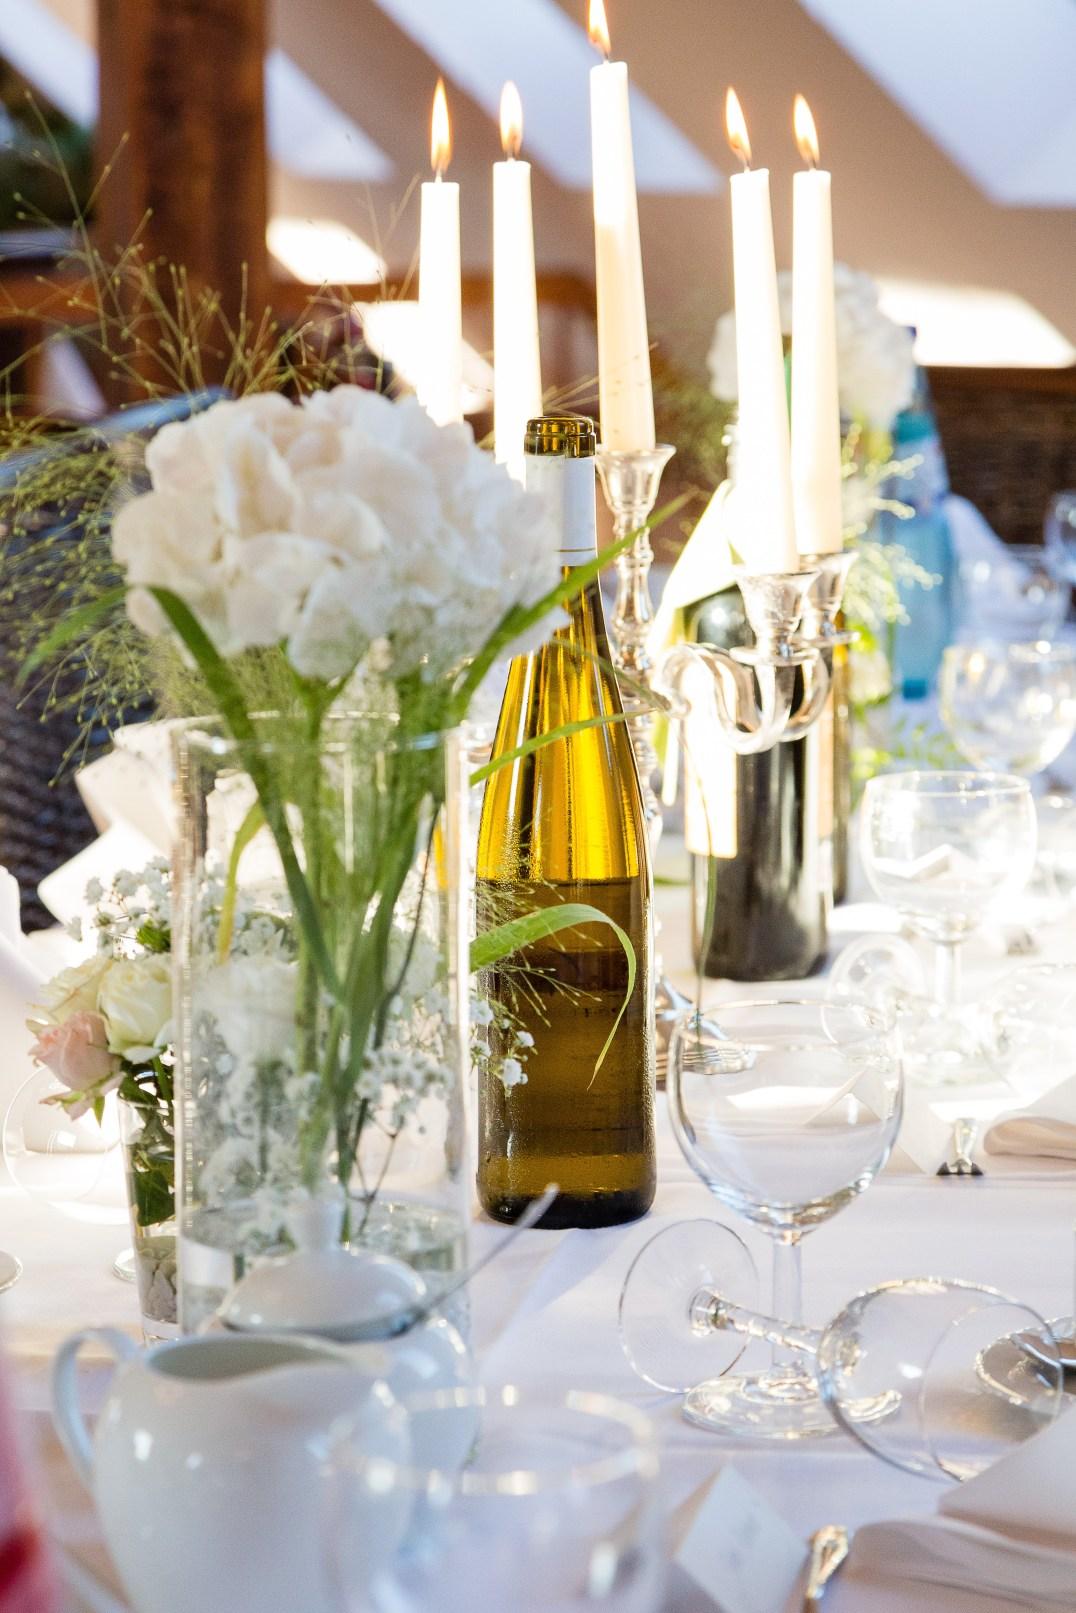 Feiern in Schäpe bei Beelitz